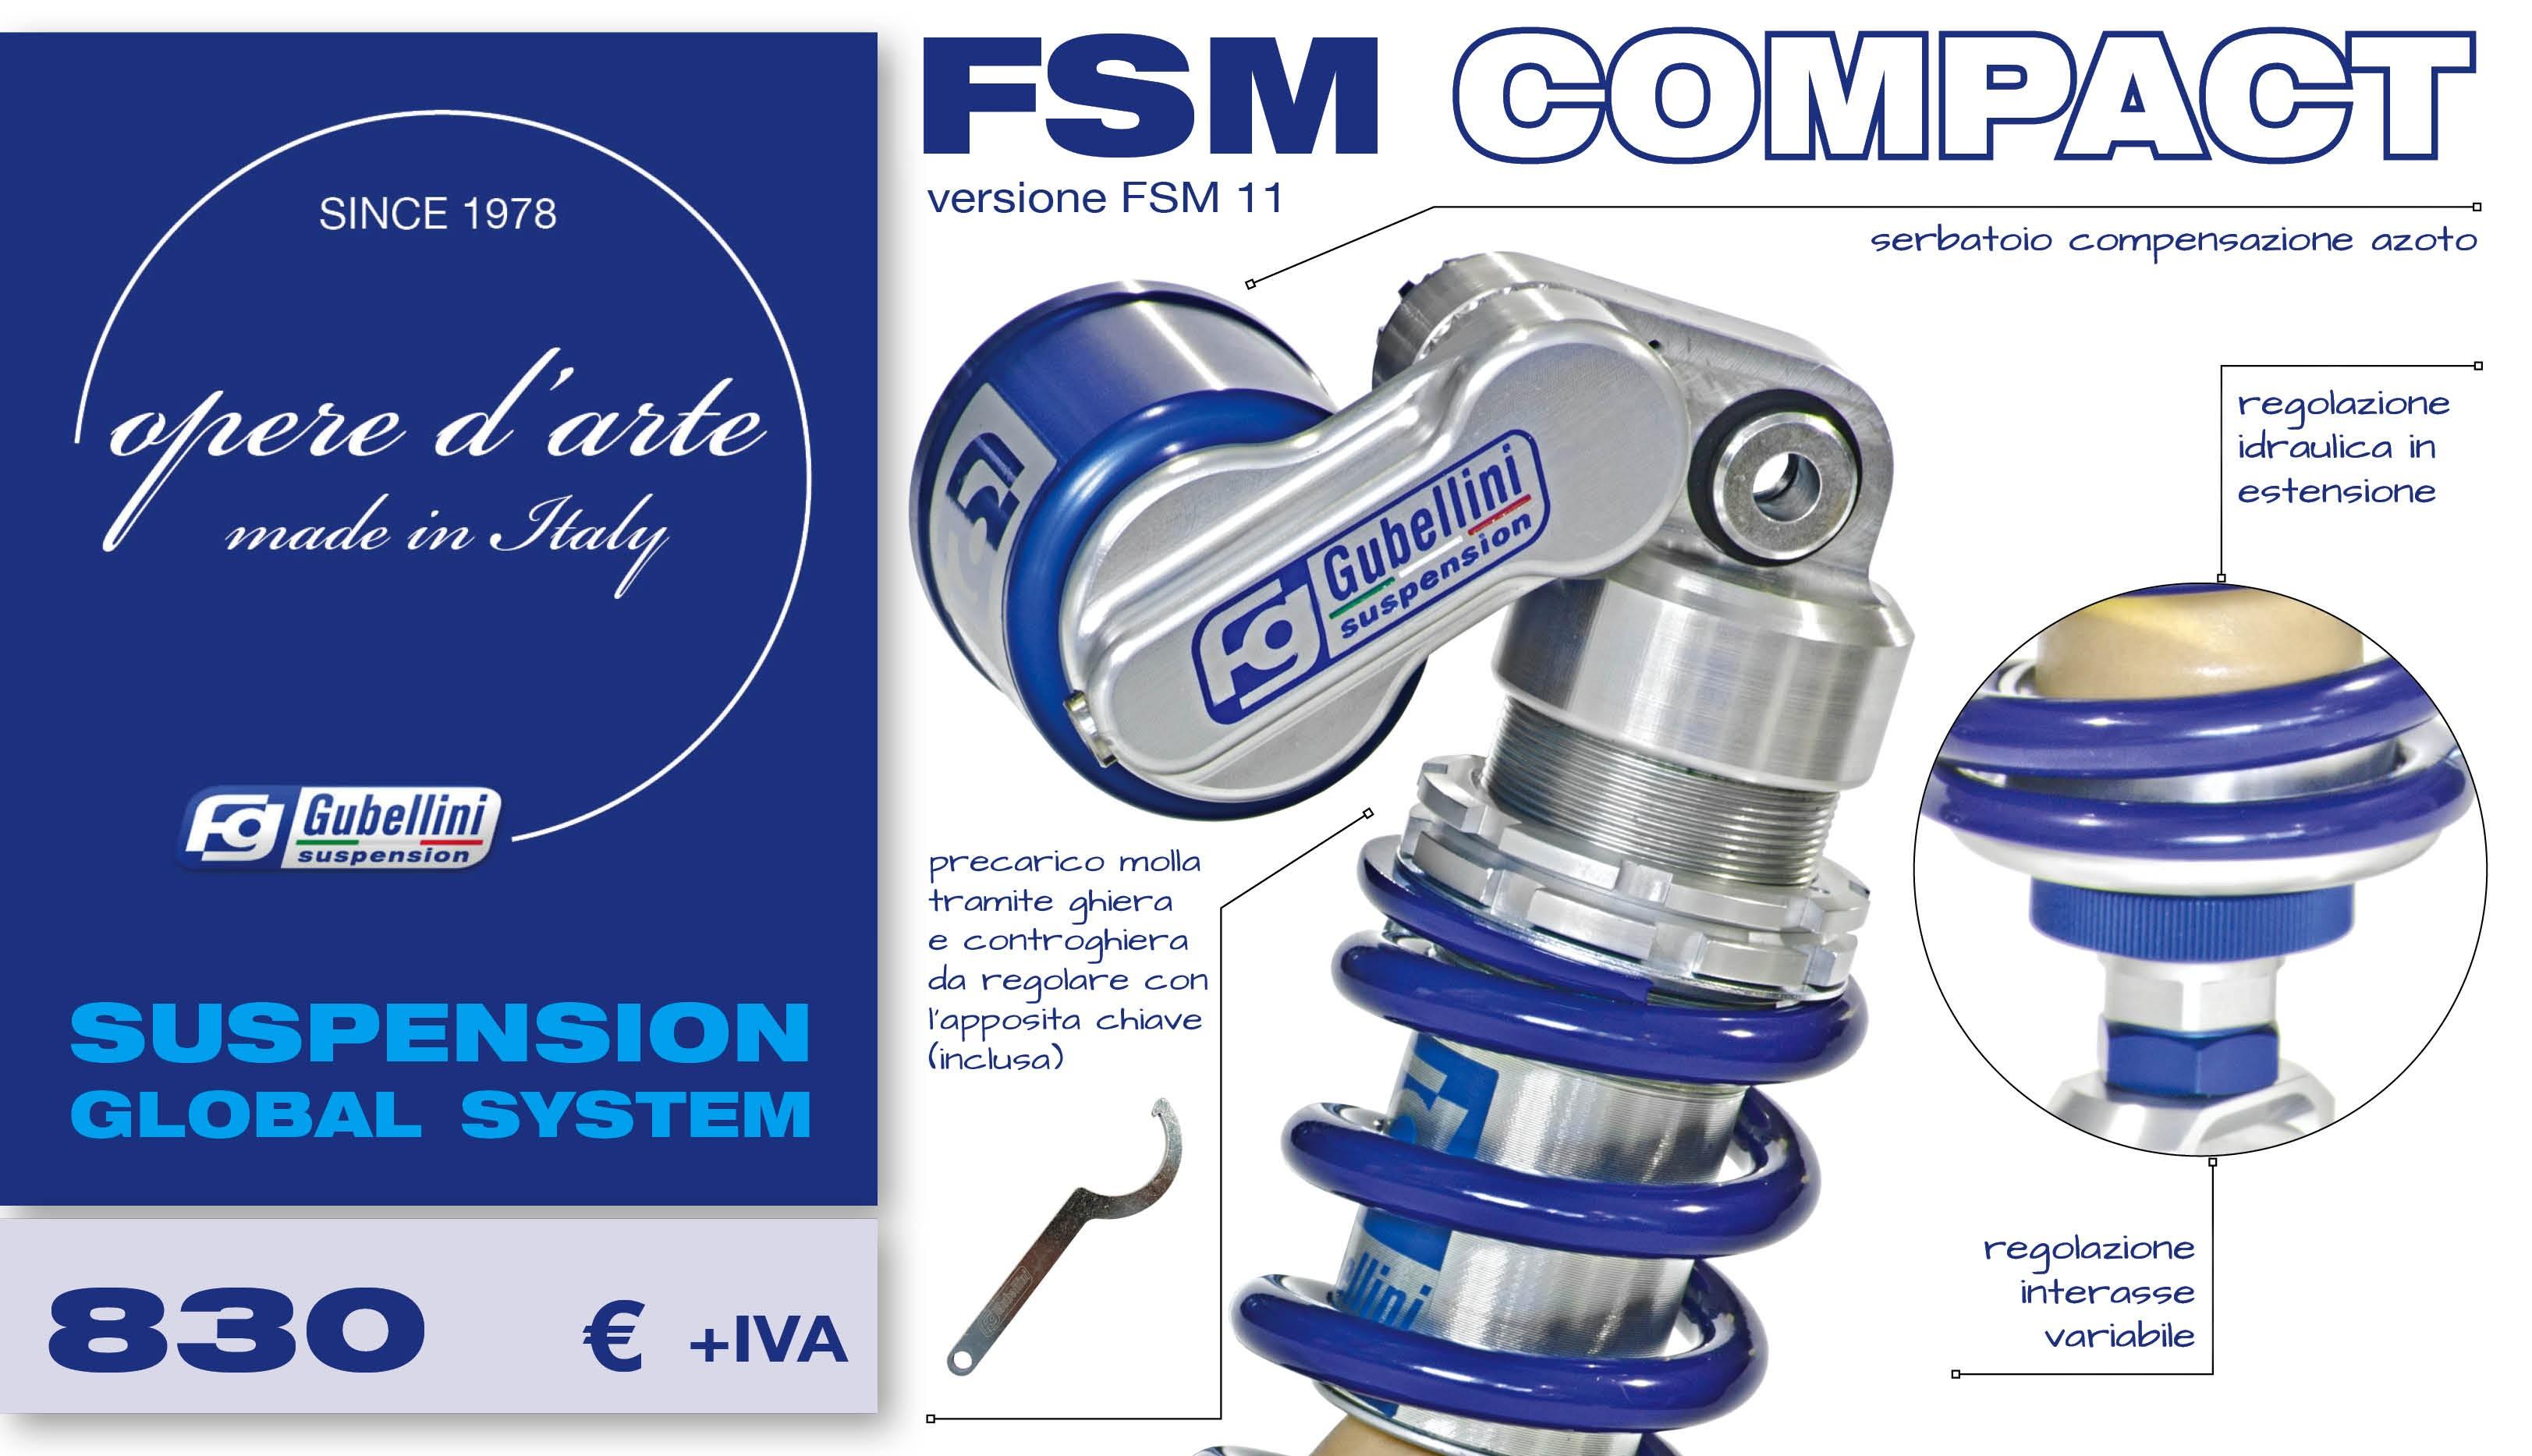 FSM 11 COMPACT